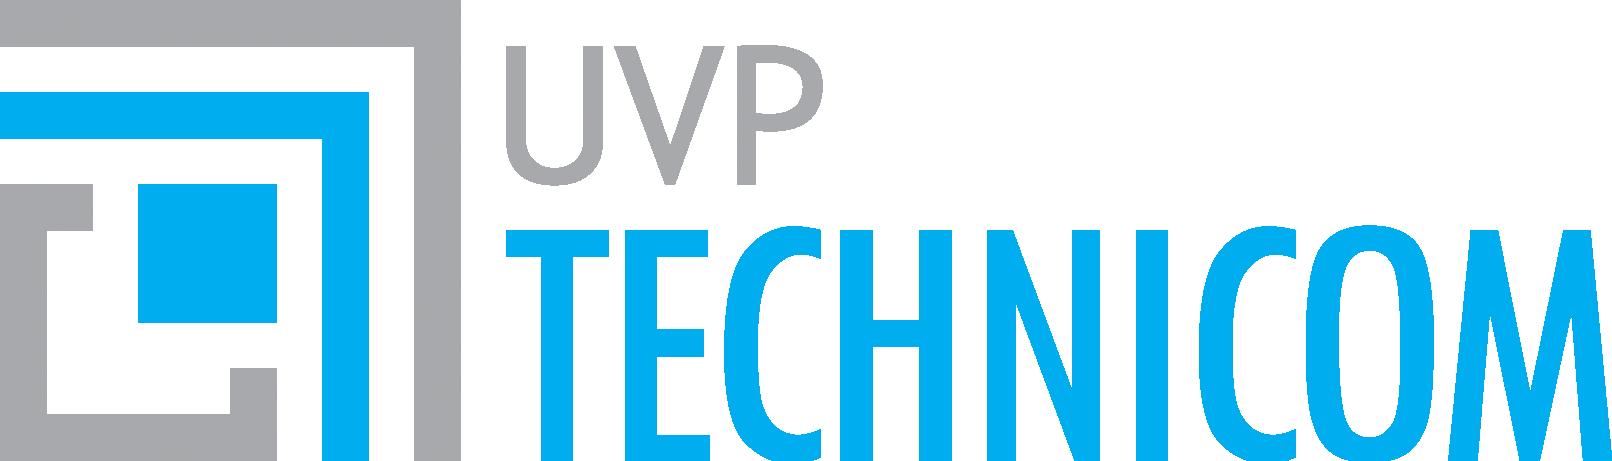 UVP Techicom